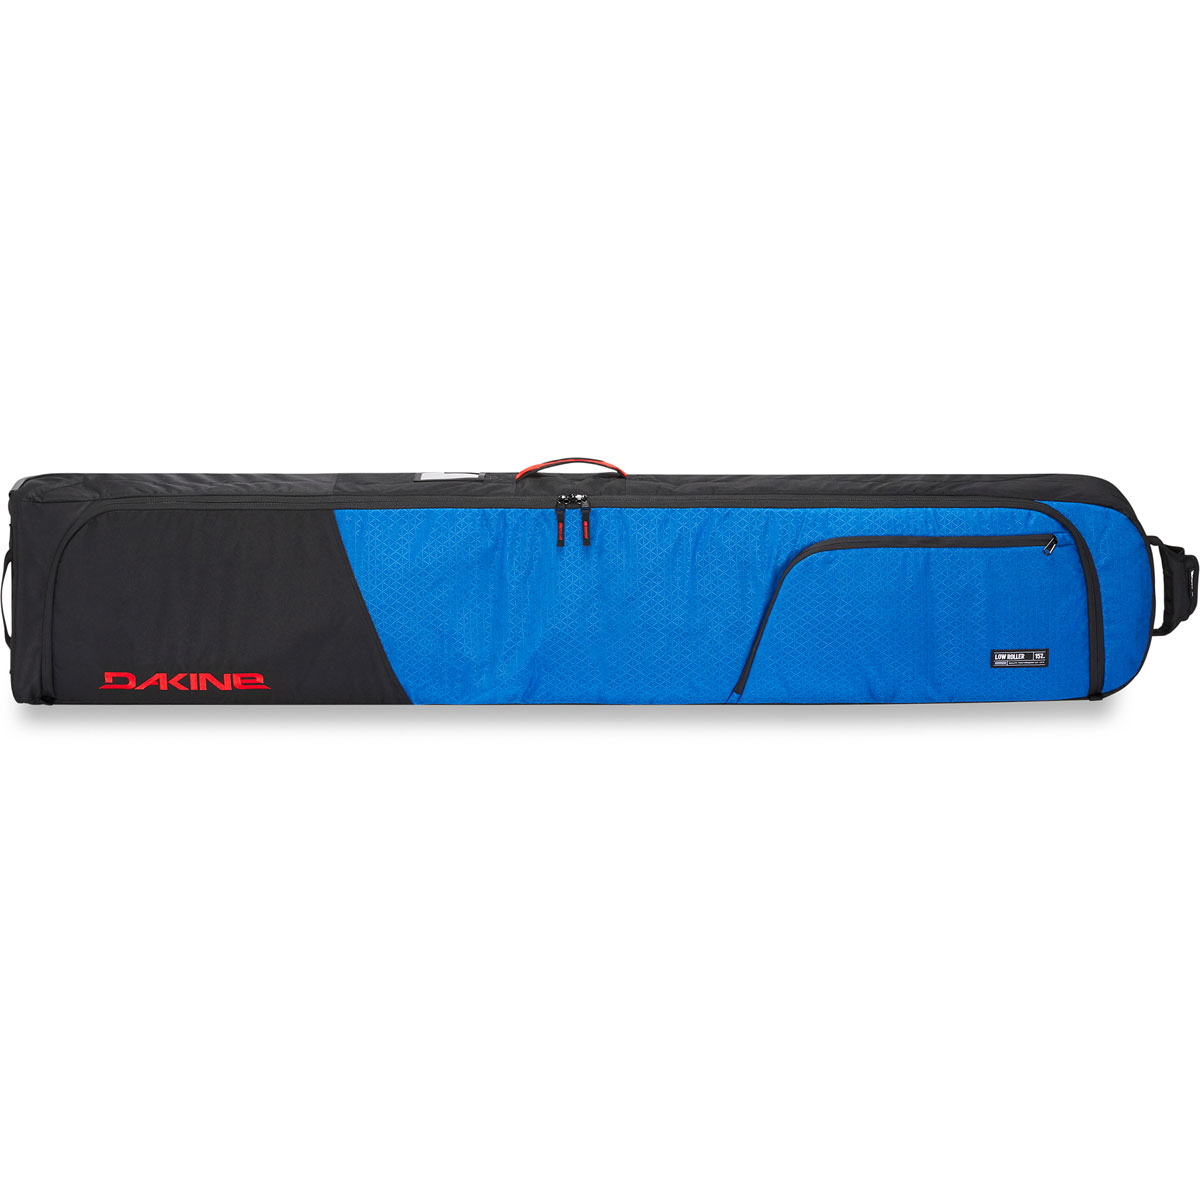 Dakine-Low-Roller-Snowboard-Bag-2019 thumbnail 6